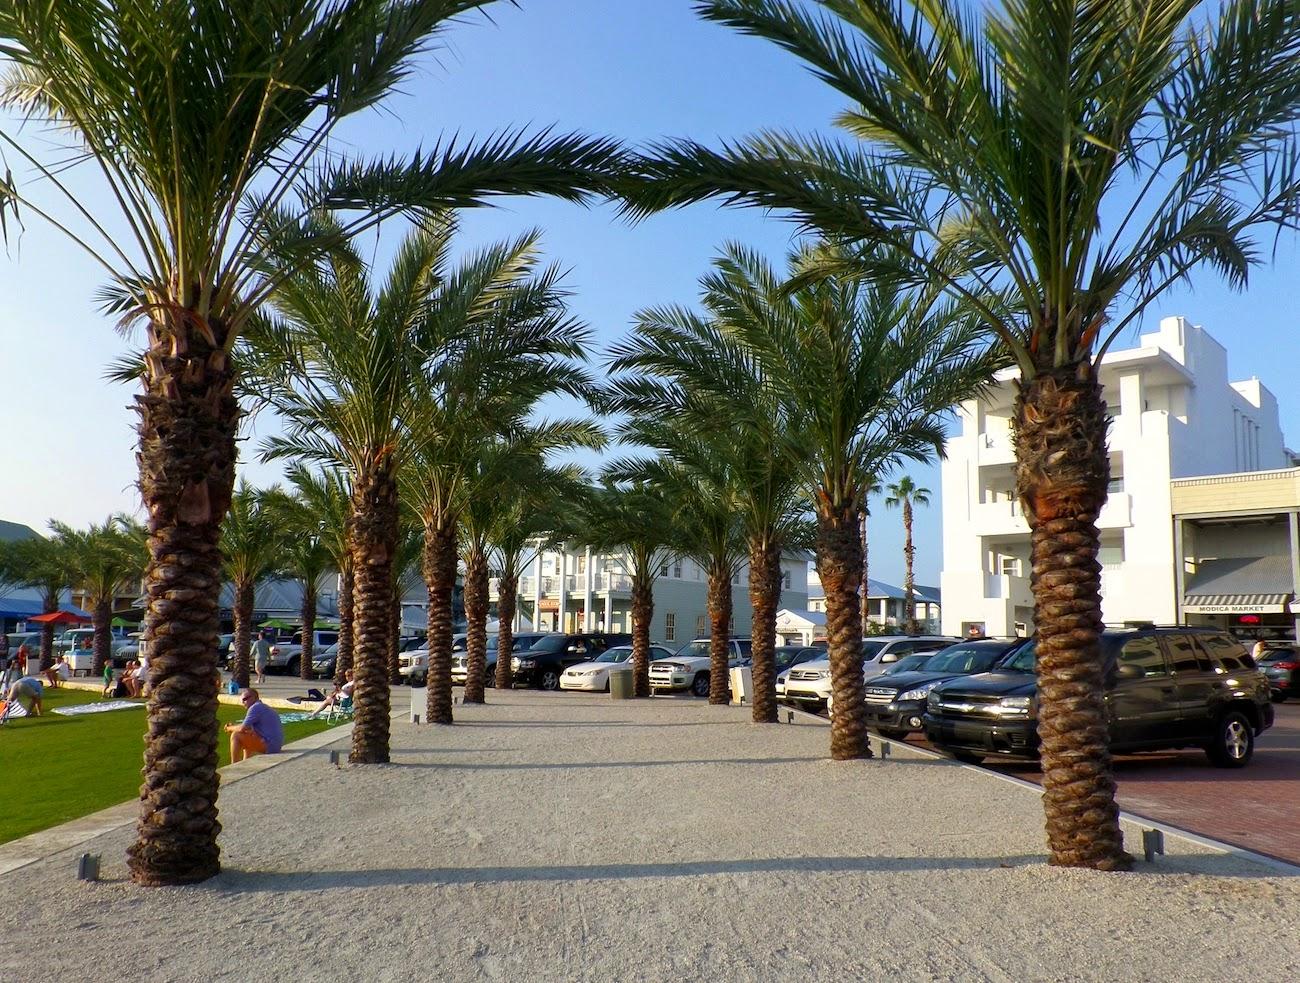 Seaside Florida, Seaside, Florida, Palm Trees, Trendy in Texas Blog